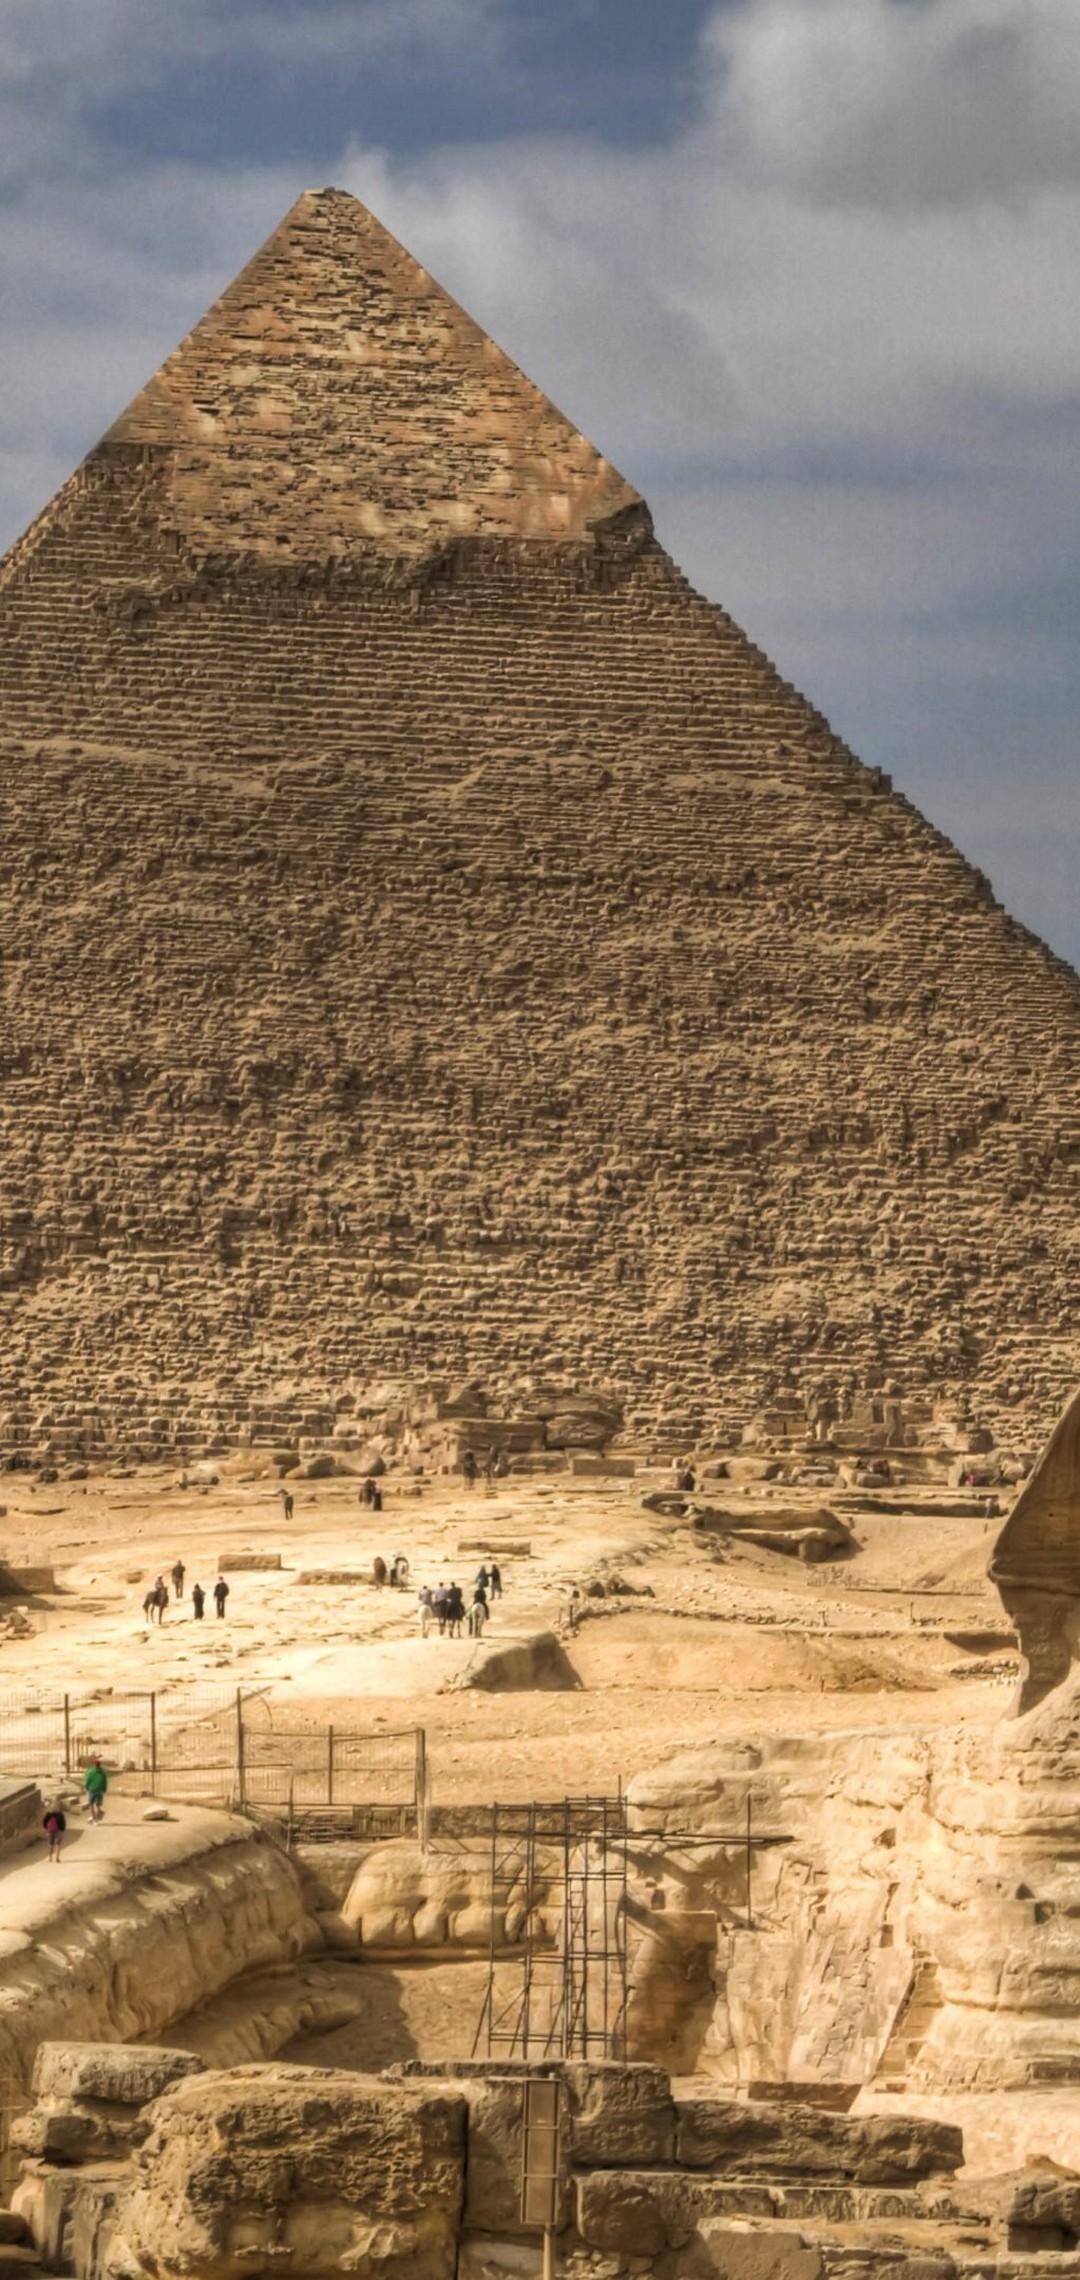 Pyramid Wallpaper - [1080x2280]